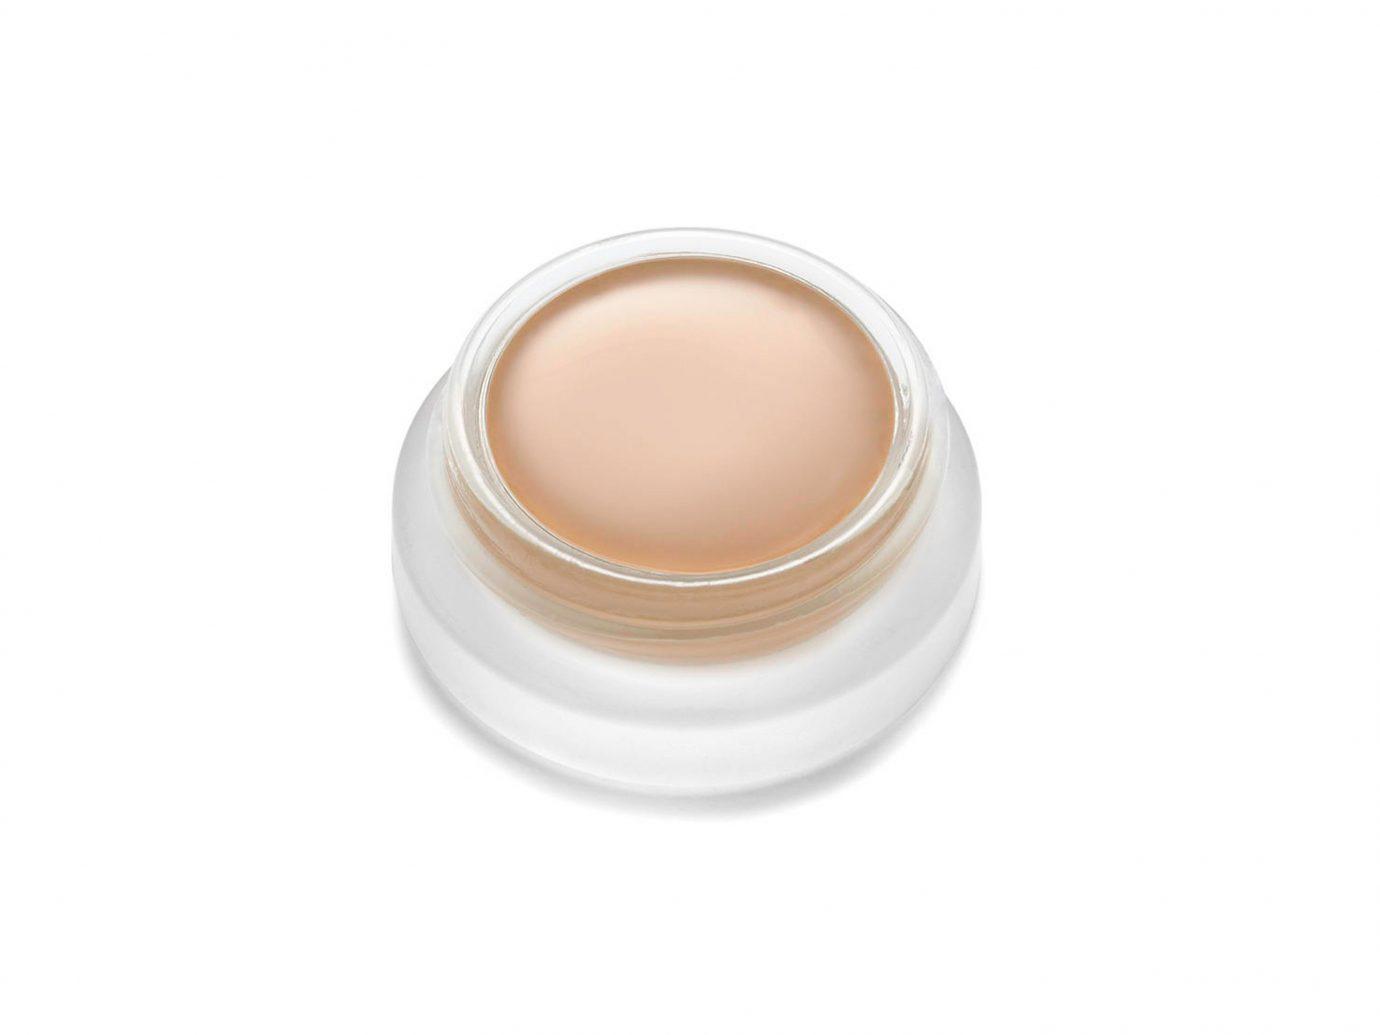 Health + Wellness Style + Design Travel Shop Beauty product beige cosmetics peach powder